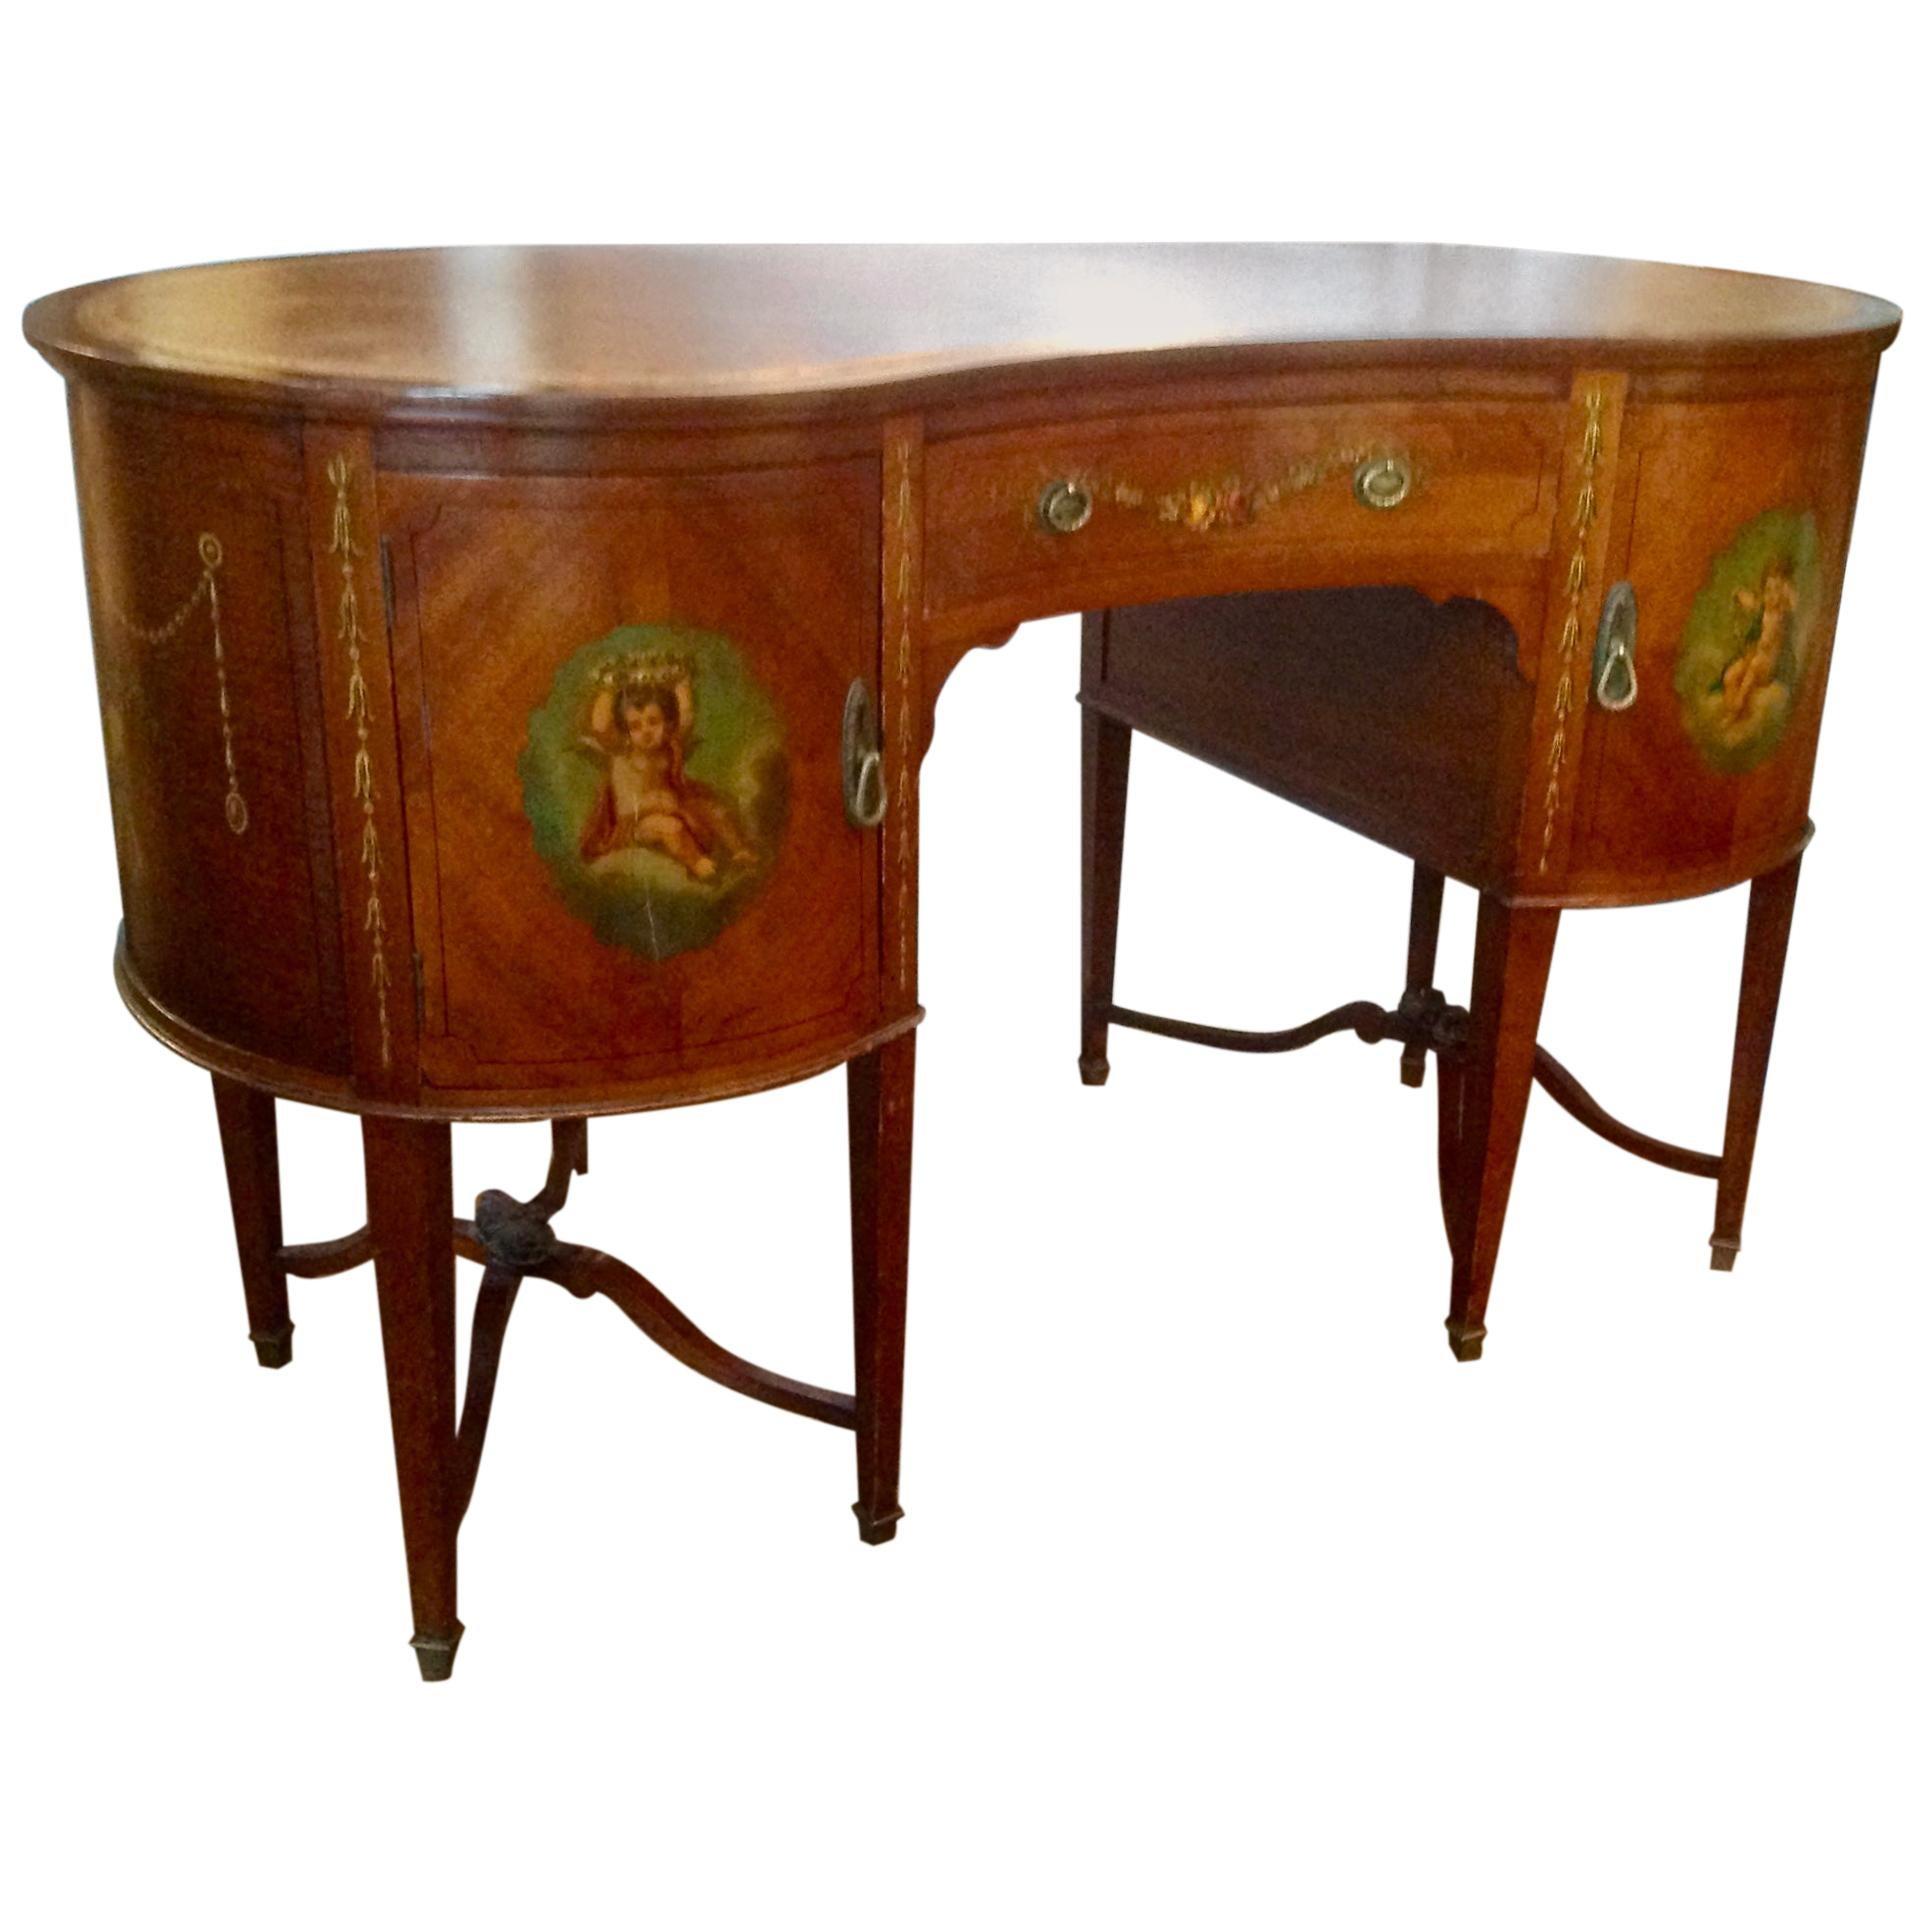 19th Century English Adam Style Vanity